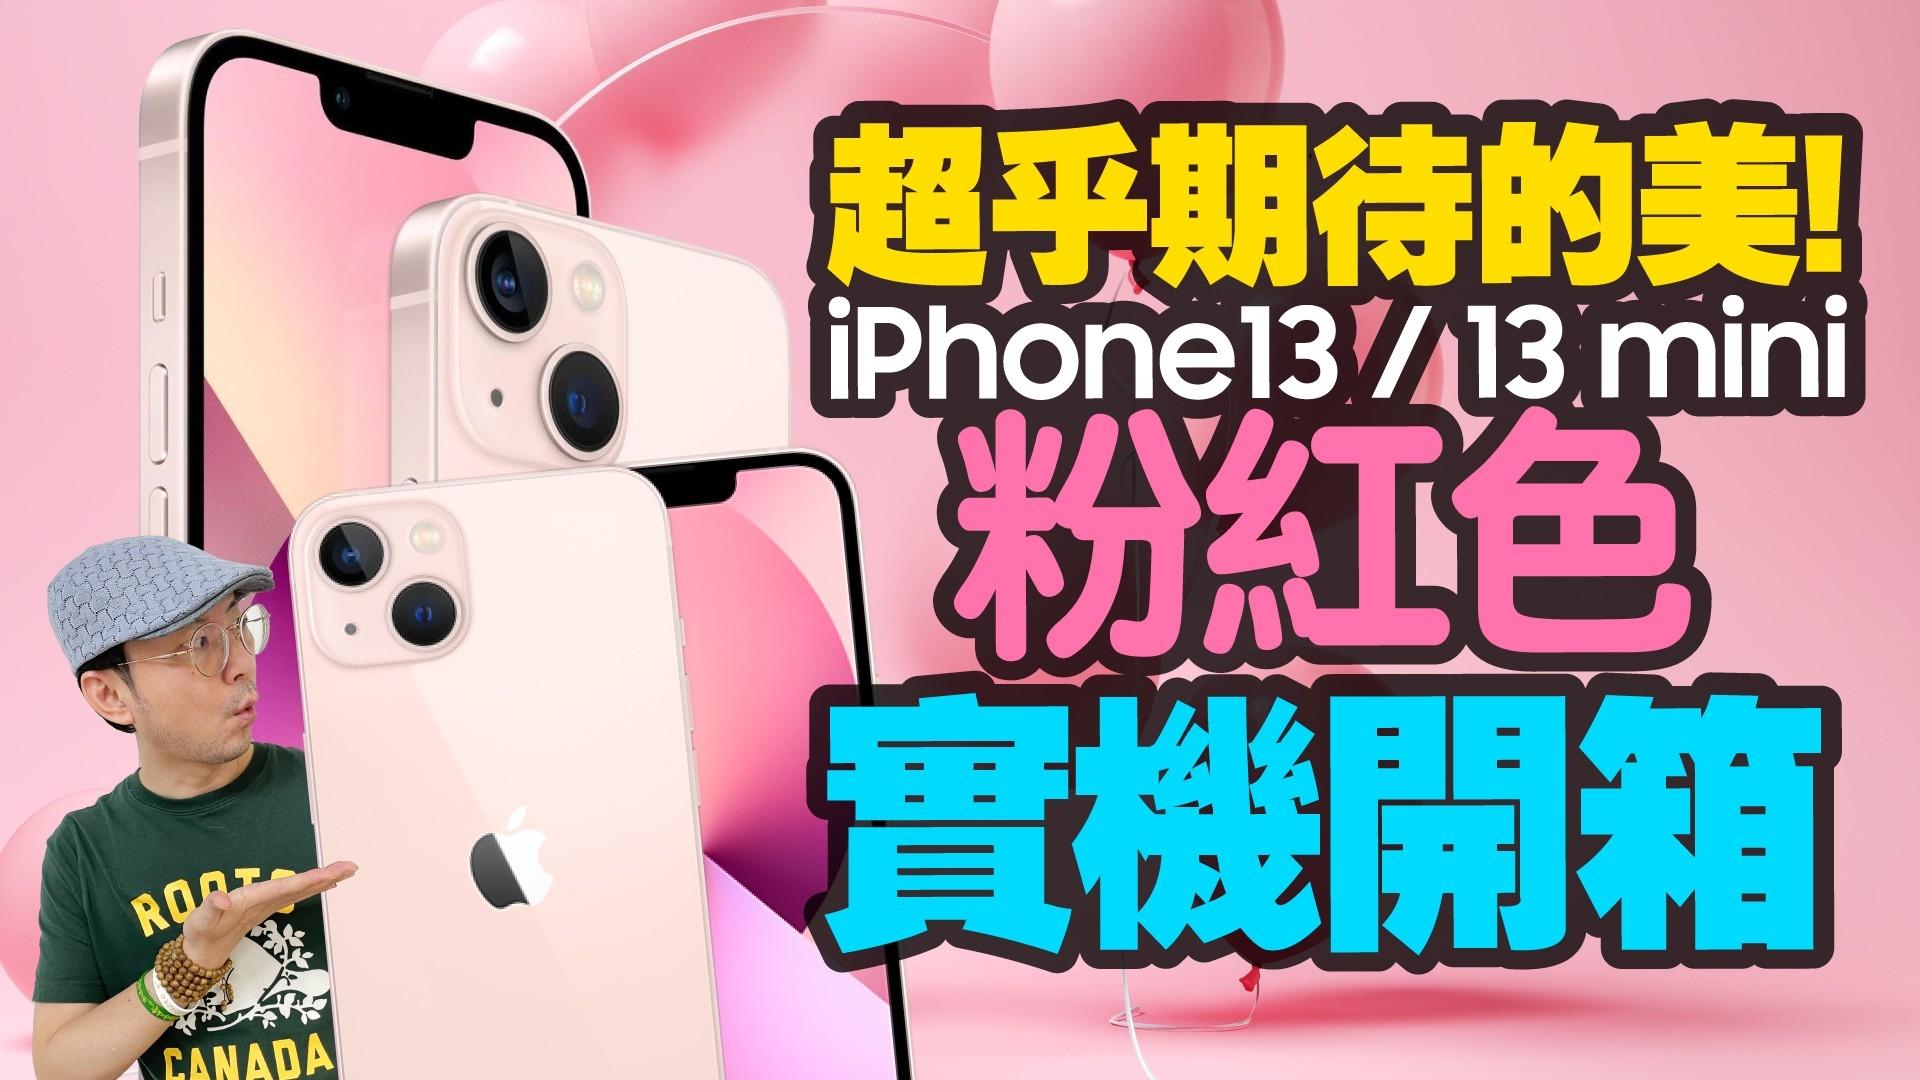 iPhone13_iPhone13 mini 開箱!粉紅色與星光色 實機上手玩